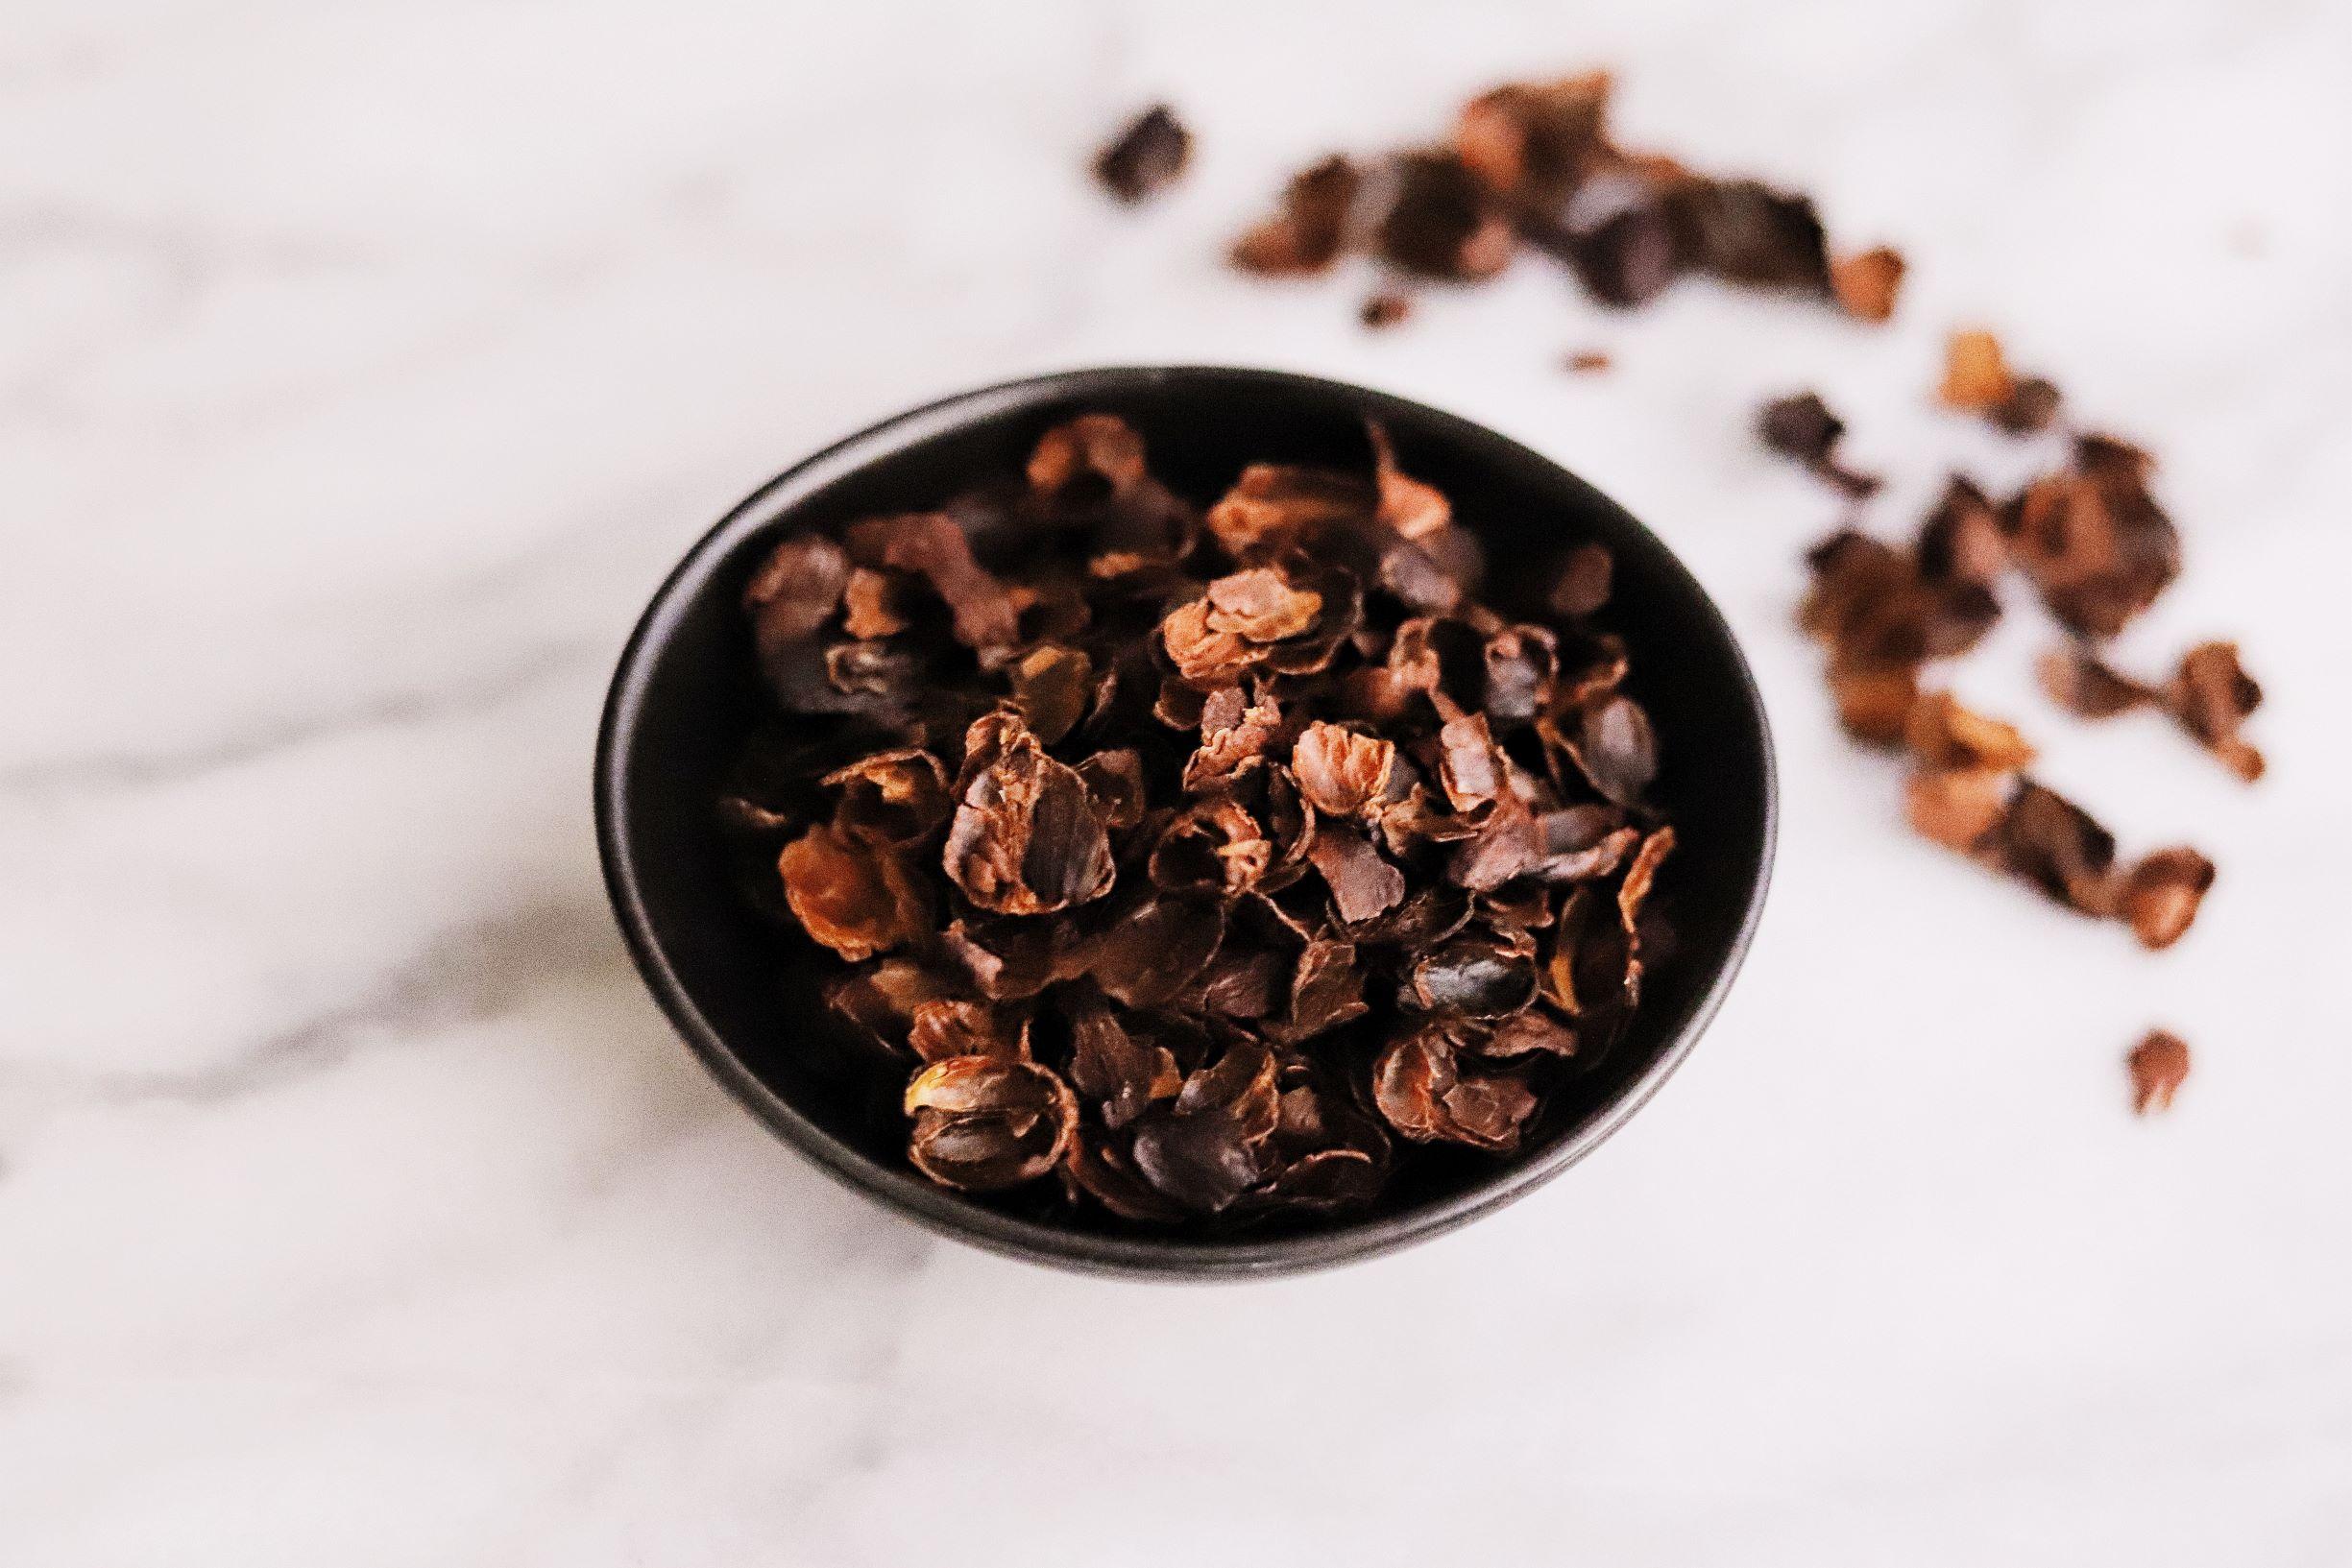 LeClair Organics cascara tea, coffee berry tea, coffee cherry tea, cascara latte and cascara cocktails Canada and USA